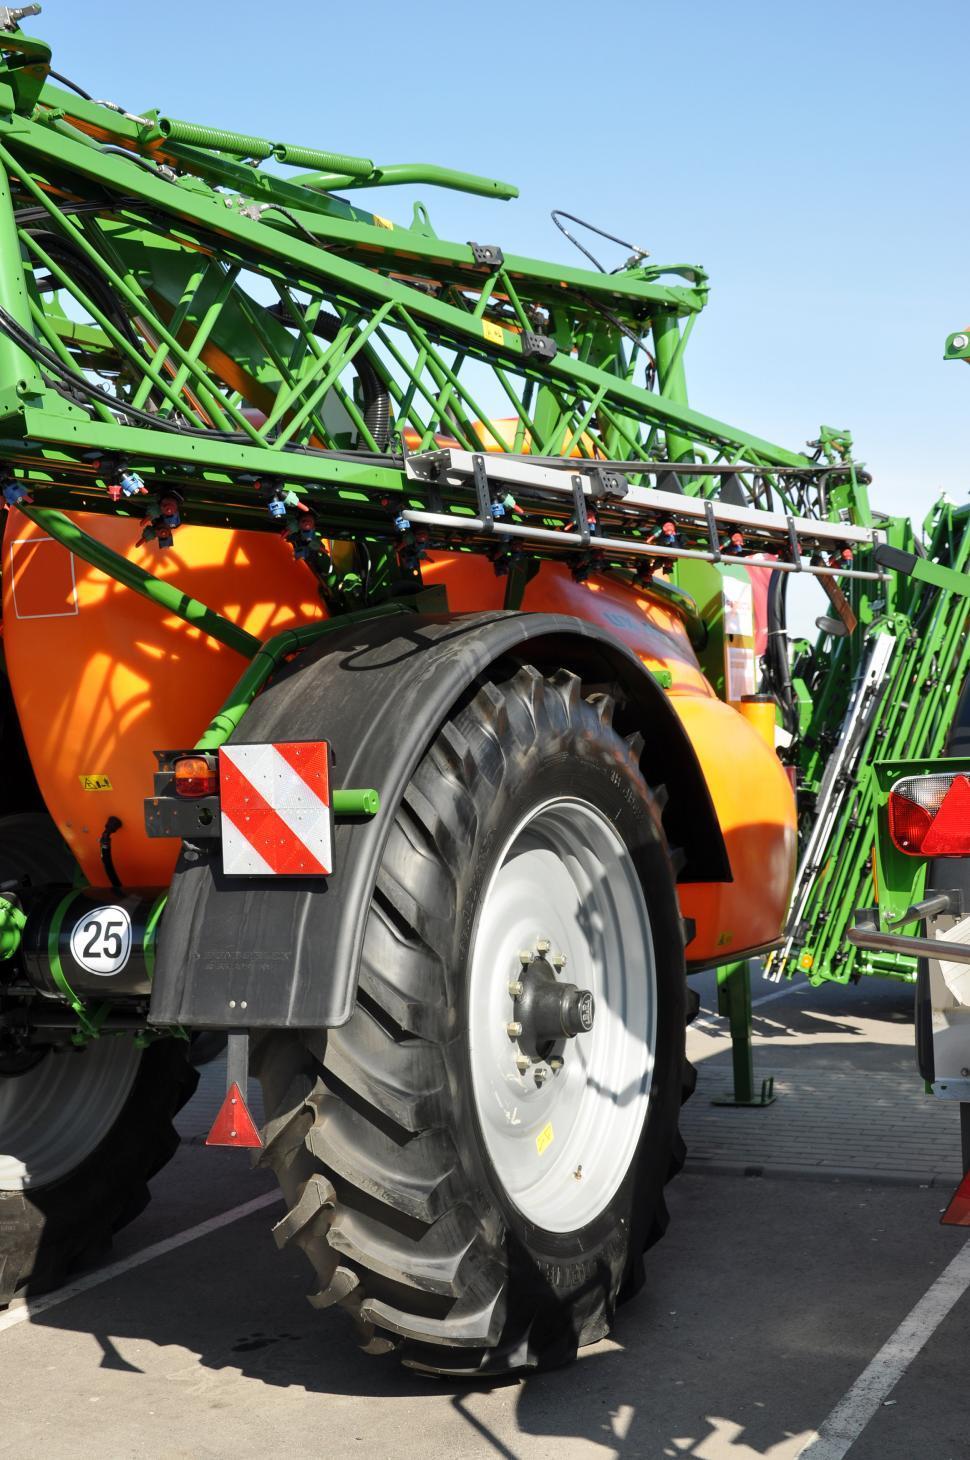 Download Free Stock HD Photo of Wheel of field sprayer Online